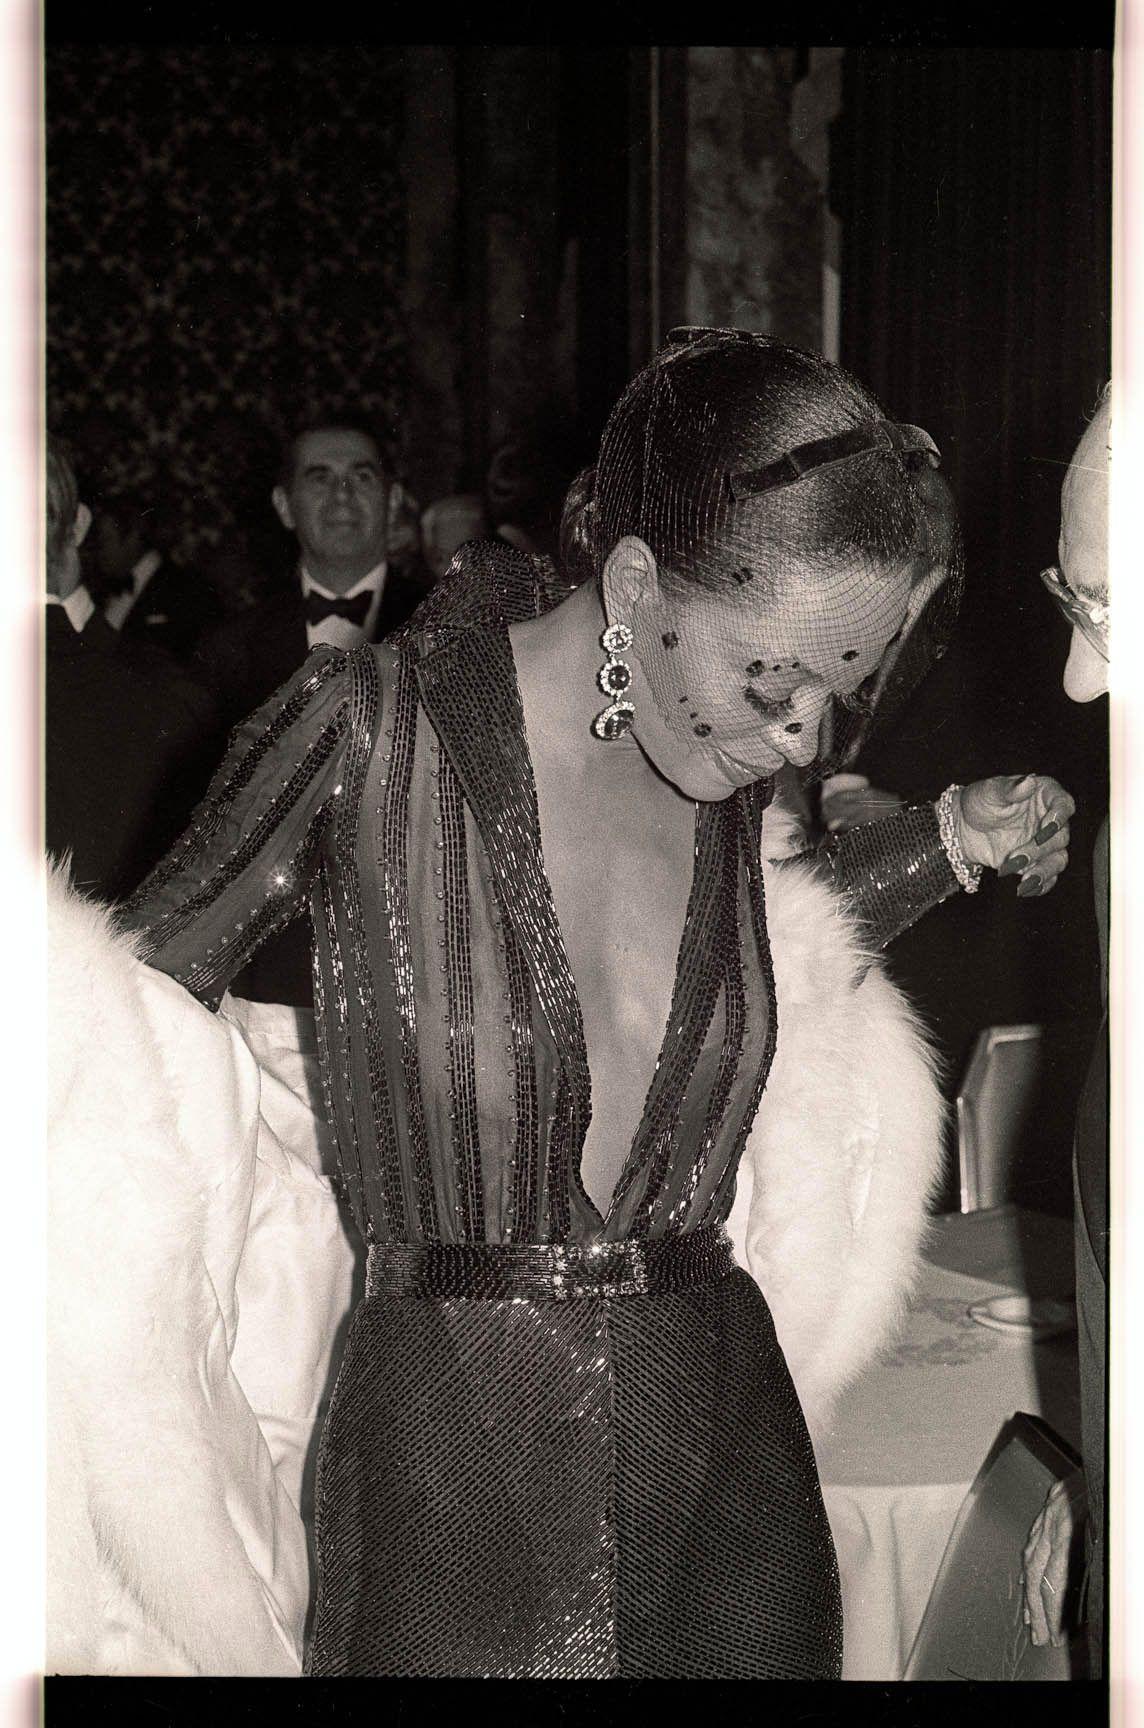 Paparazzi Barbara Desiree nude (69 photo), Topless, Cleavage, Boobs, braless 2020